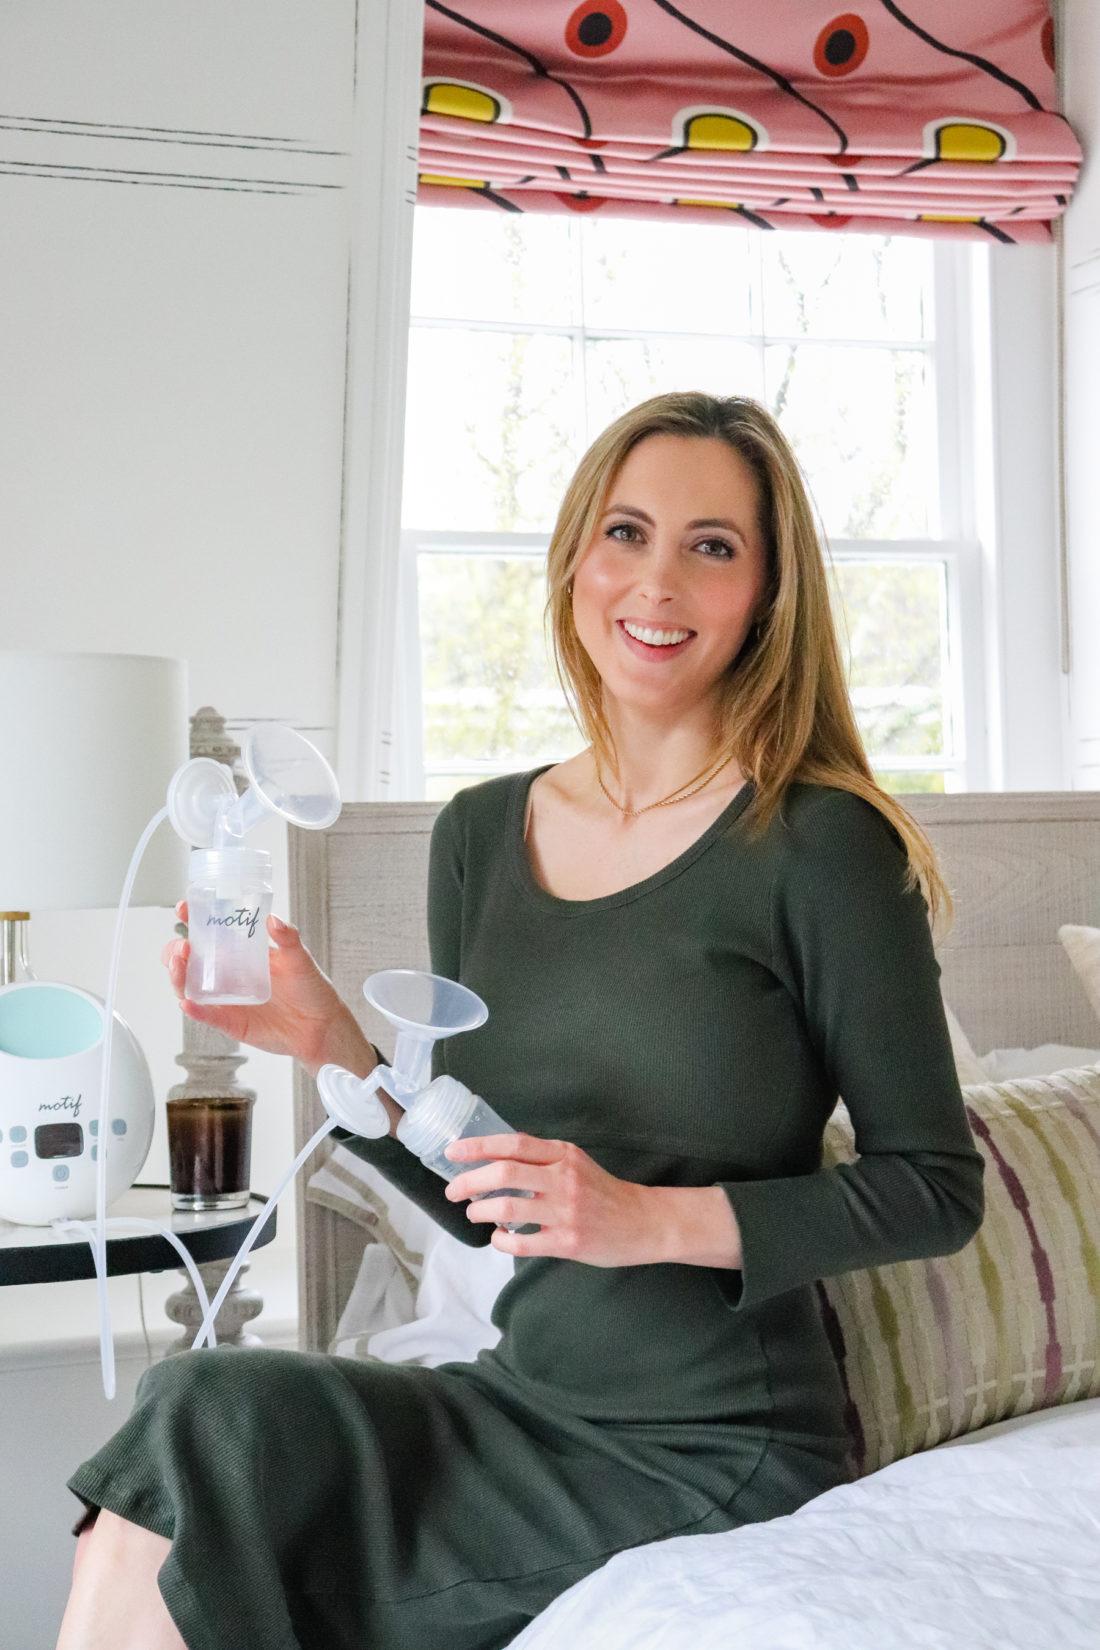 Eva Amurri shares her favorite breast pump from Motif Medical